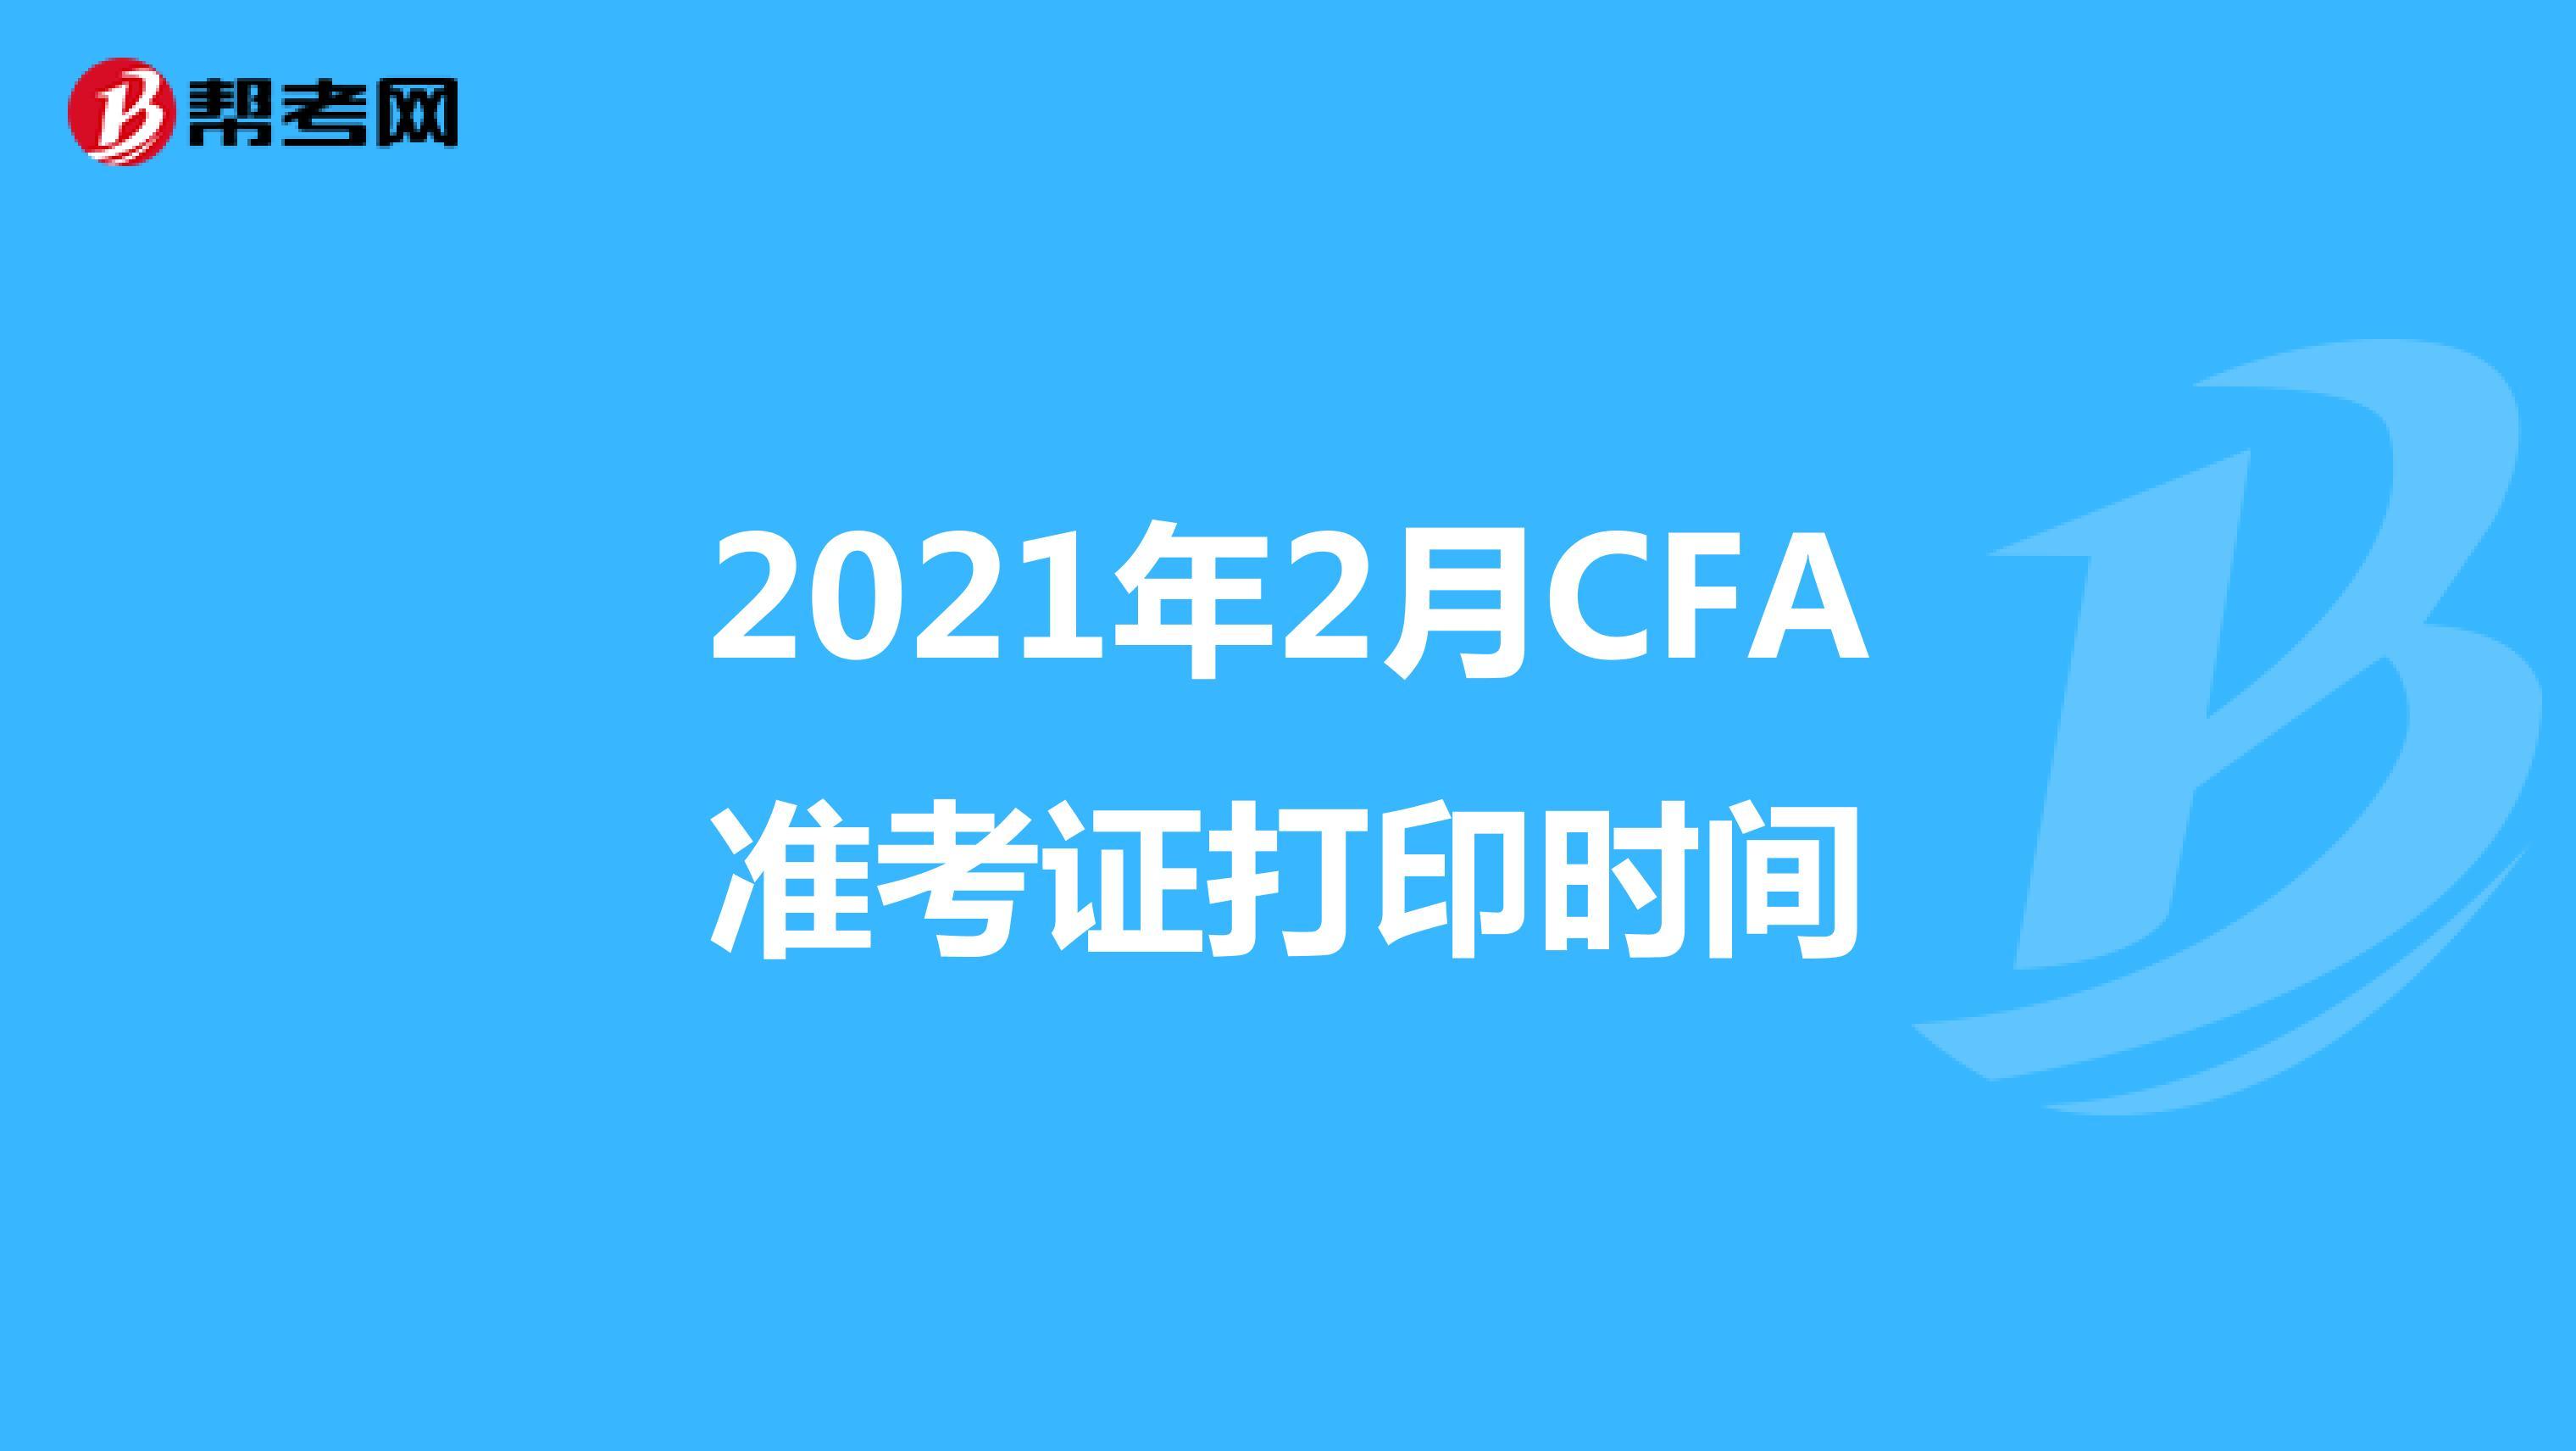 2021年2月CFA准考证打印时间